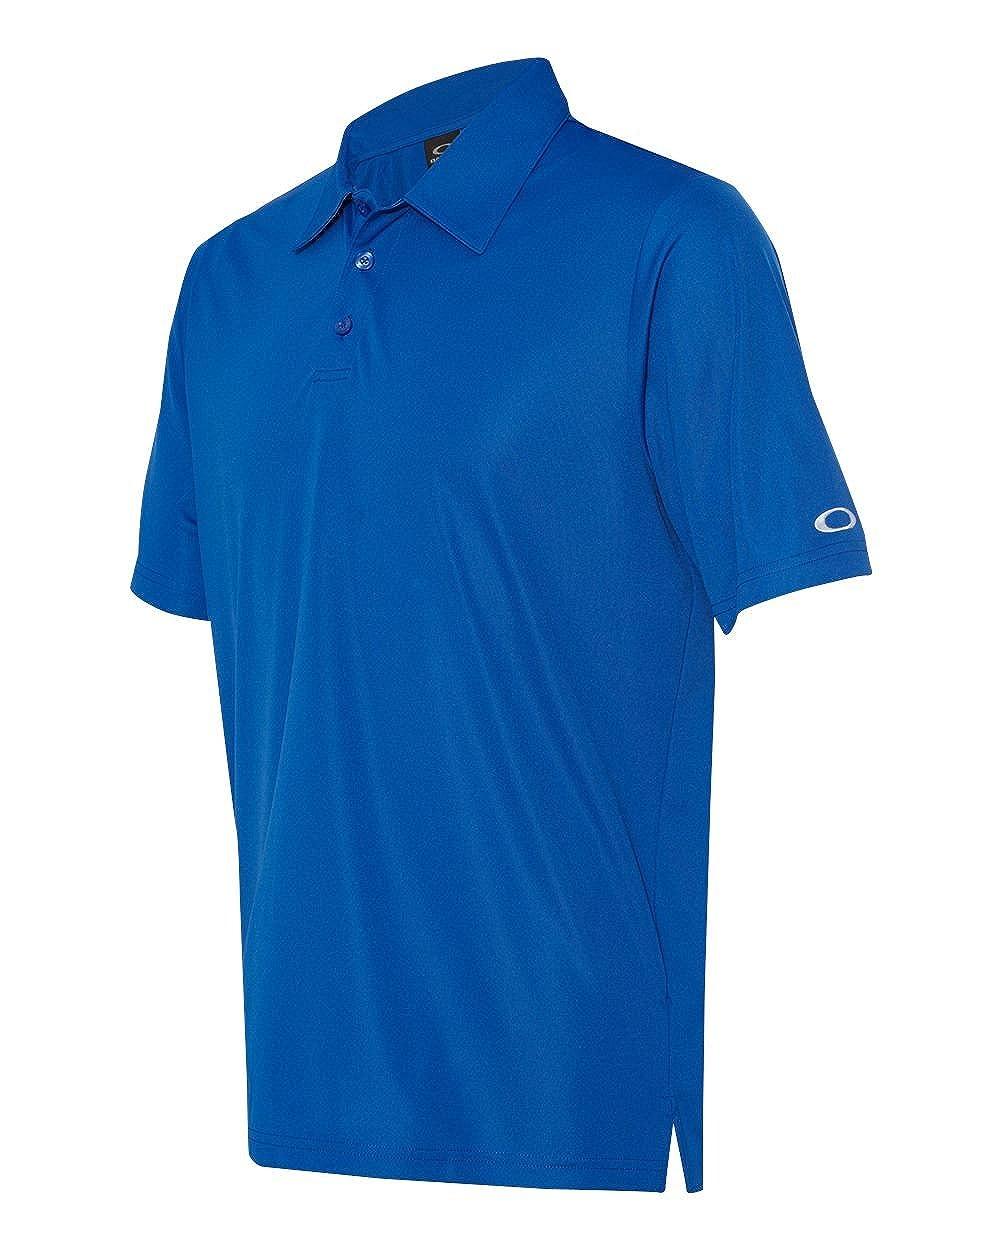 Oakley Sunglasses Ellipse Logo Golf Polo (Medium, Royal): Amazon ...